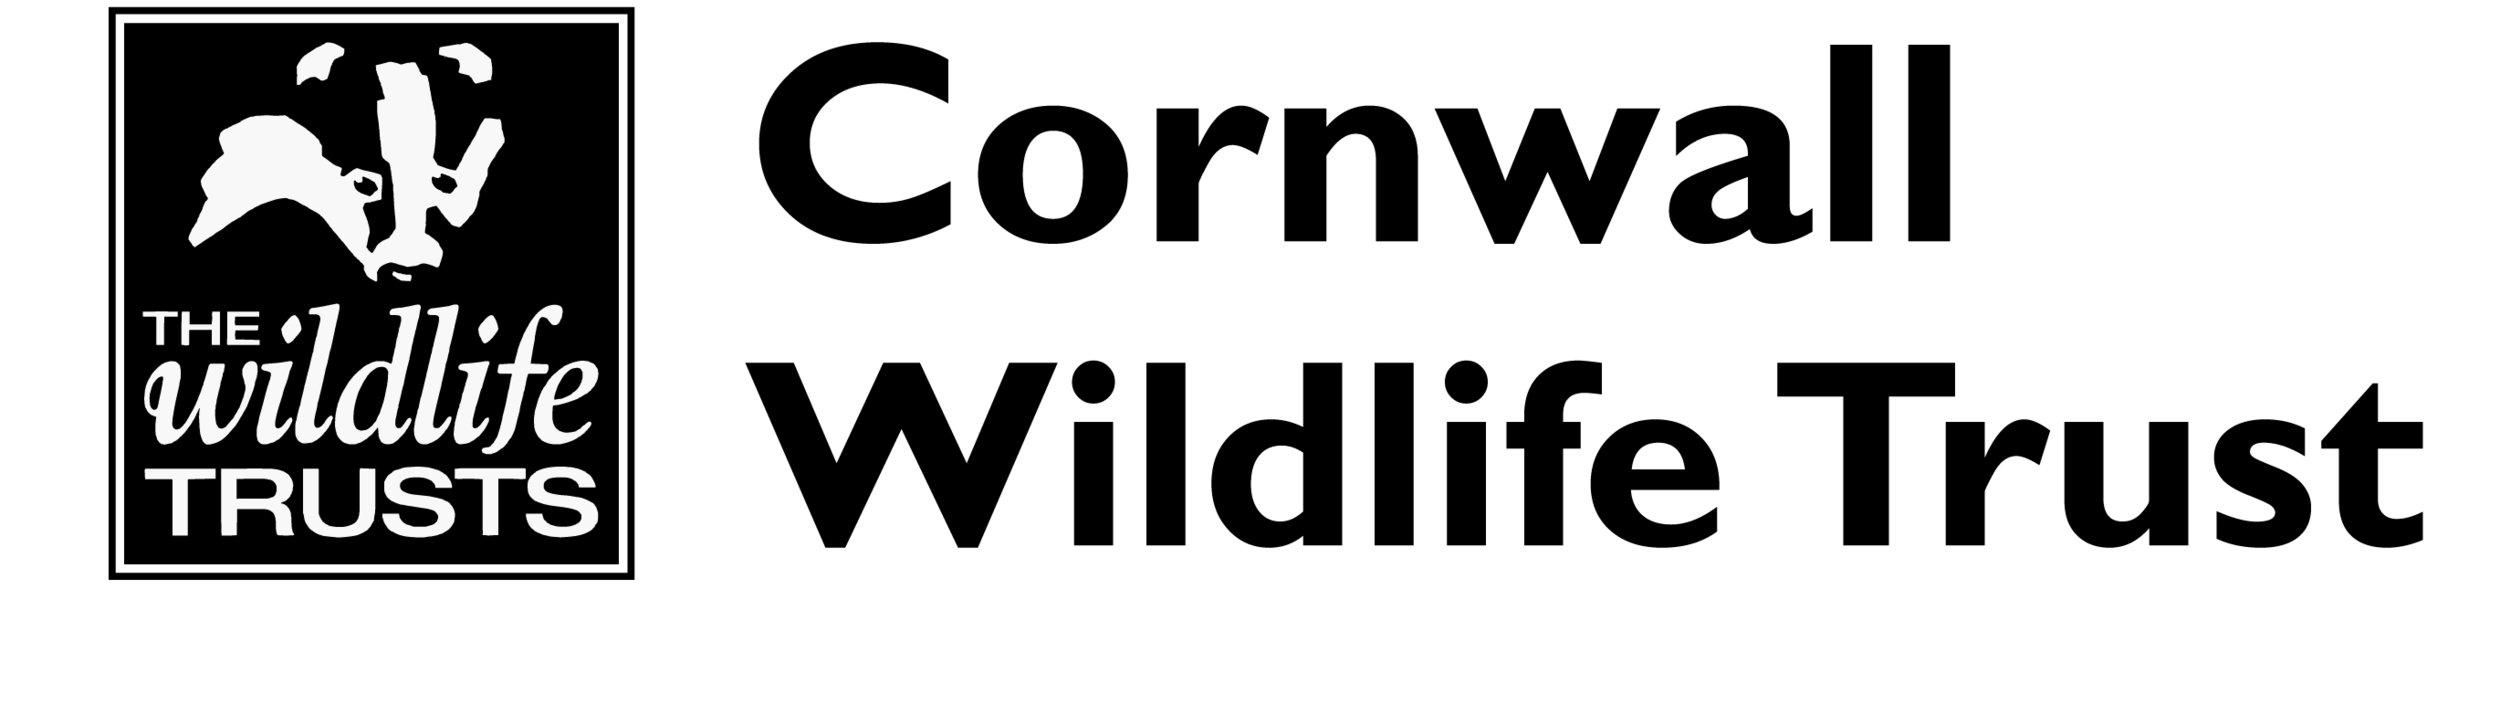 Cornwall-wildlife-trust-logo-apr-14-left.jpg